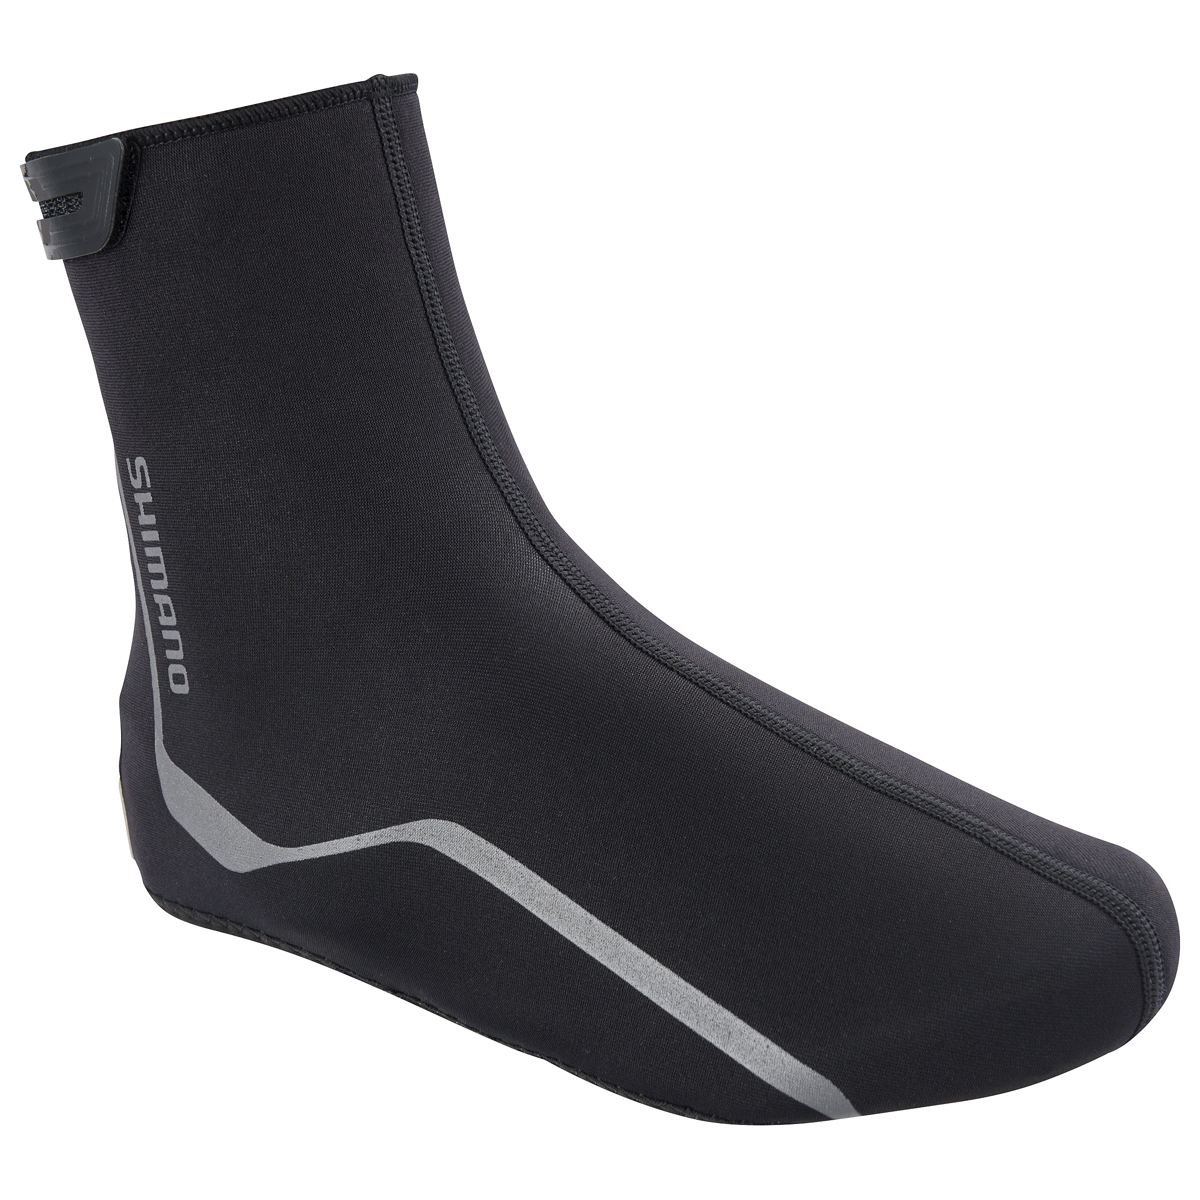 Shimano Ochraniacze na buty Basic czarne L 42-44